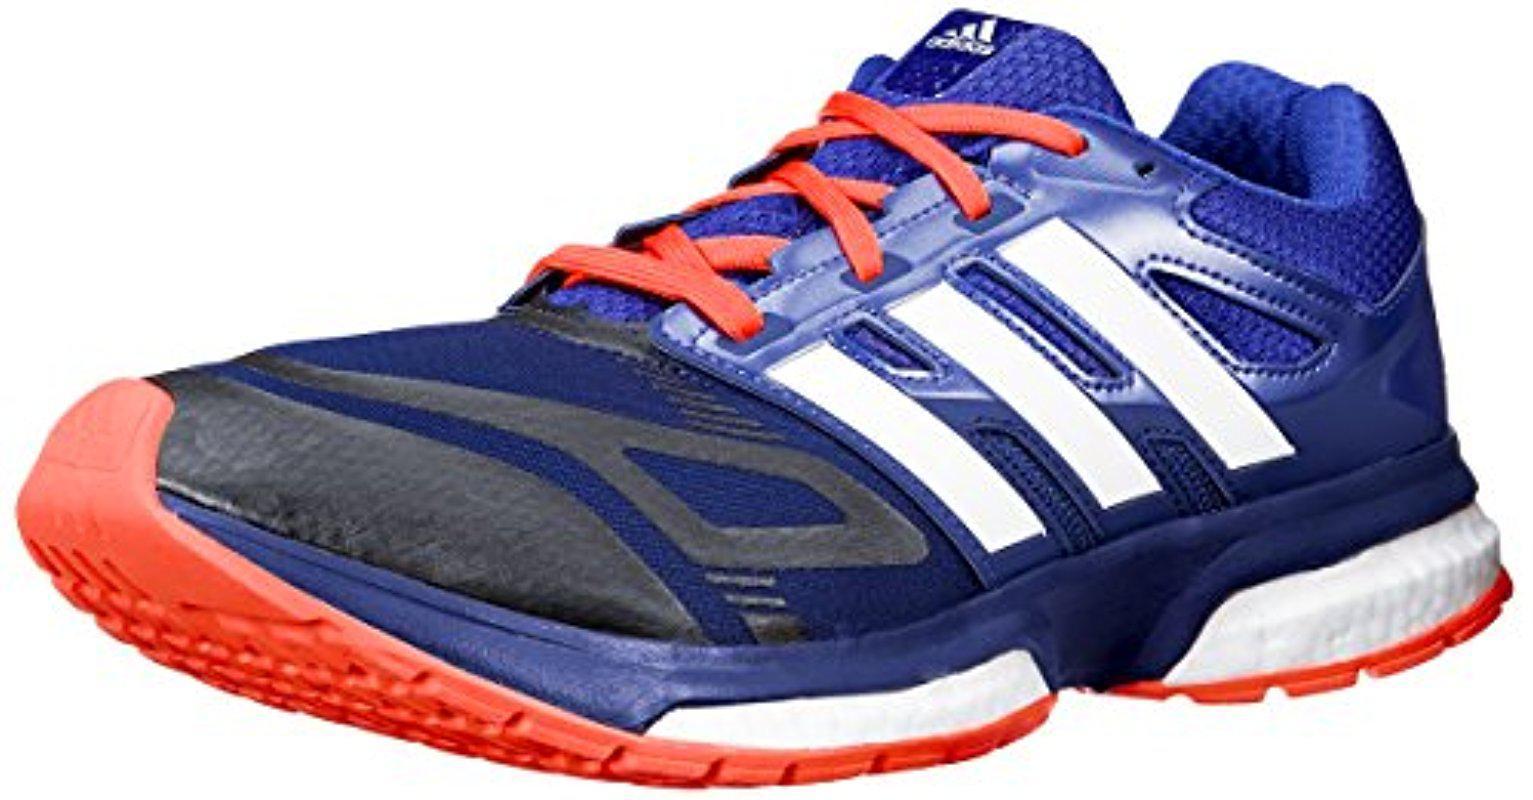 lyst adidas performance risposta aumentare techfit m scarpa da corsa in